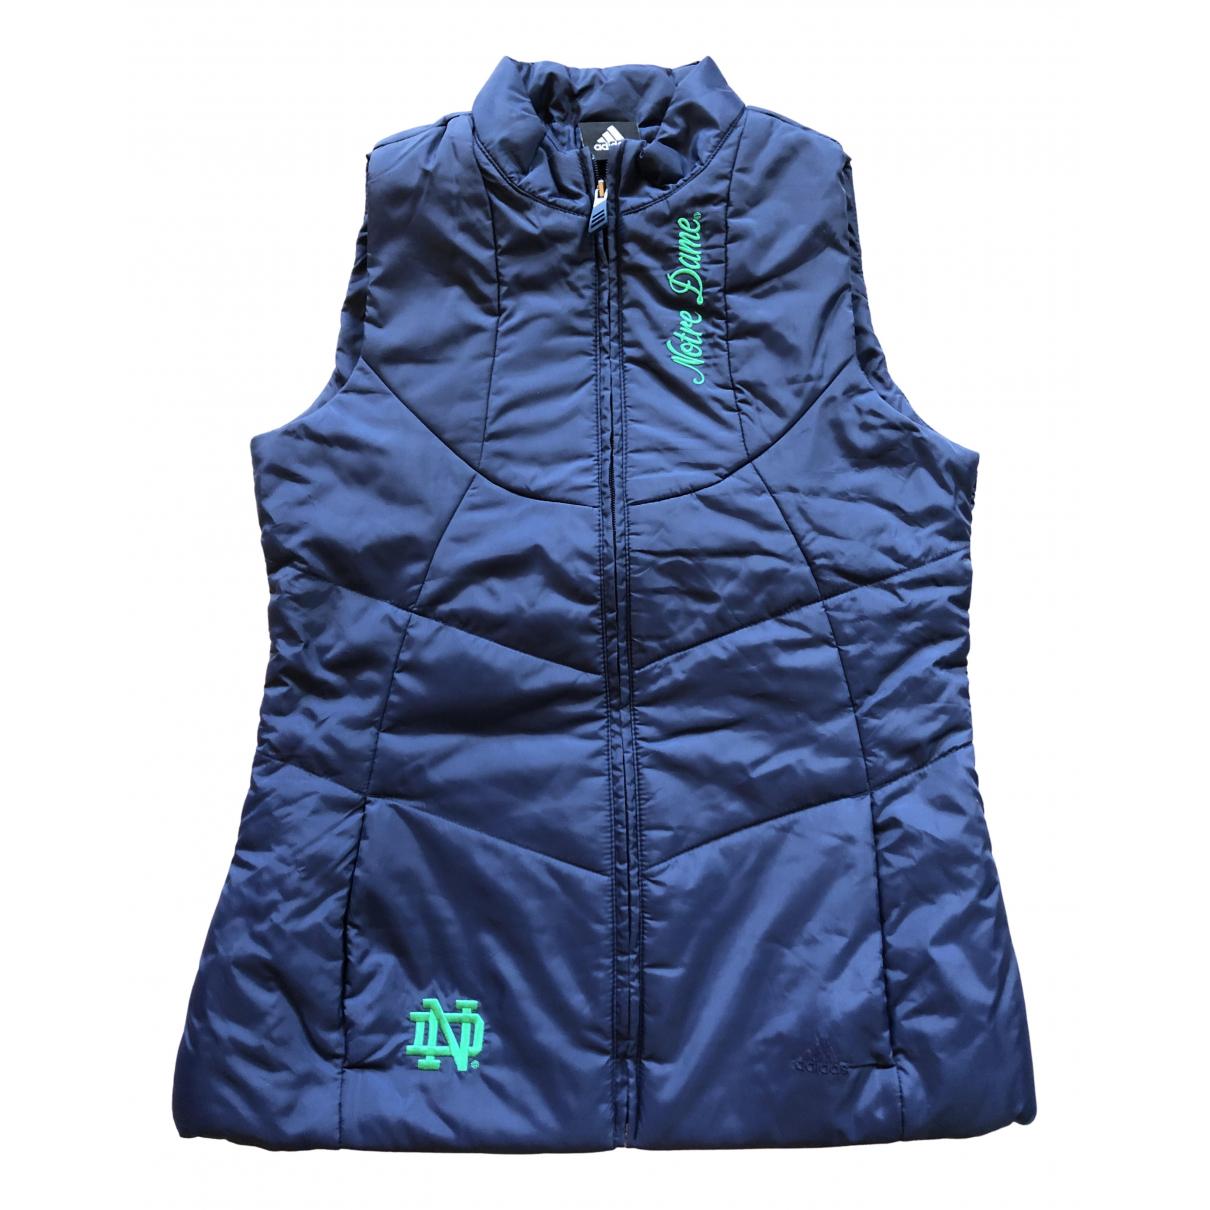 Adidas - Manteau   pour femme - marine